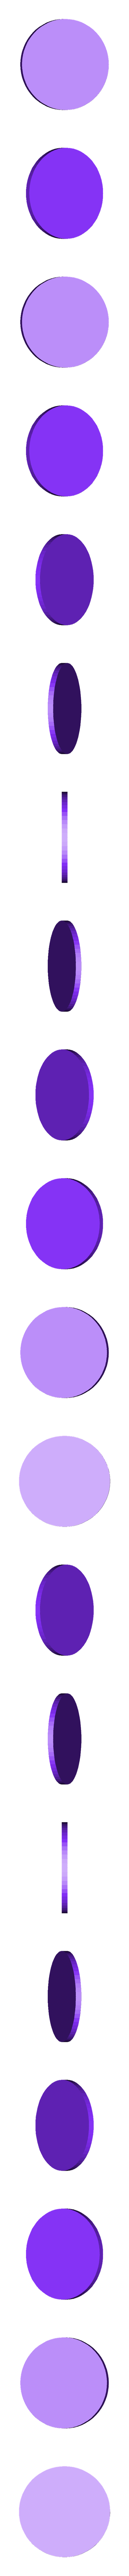 80mmx5mm_round_base.stl Télécharger fichier STL gratuit Ork Great Gargant 6mm Epic Scale Proxy model • Objet à imprimer en 3D, redstarkits